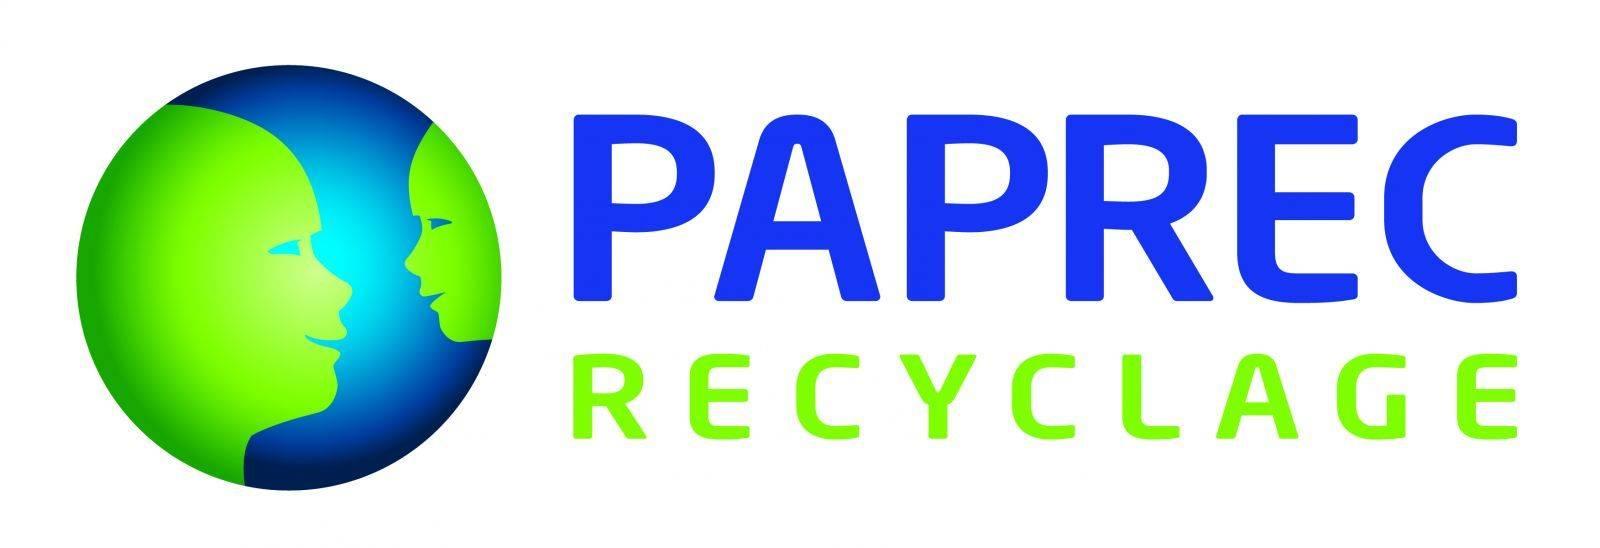 paprec_logo_recyclage_dechets